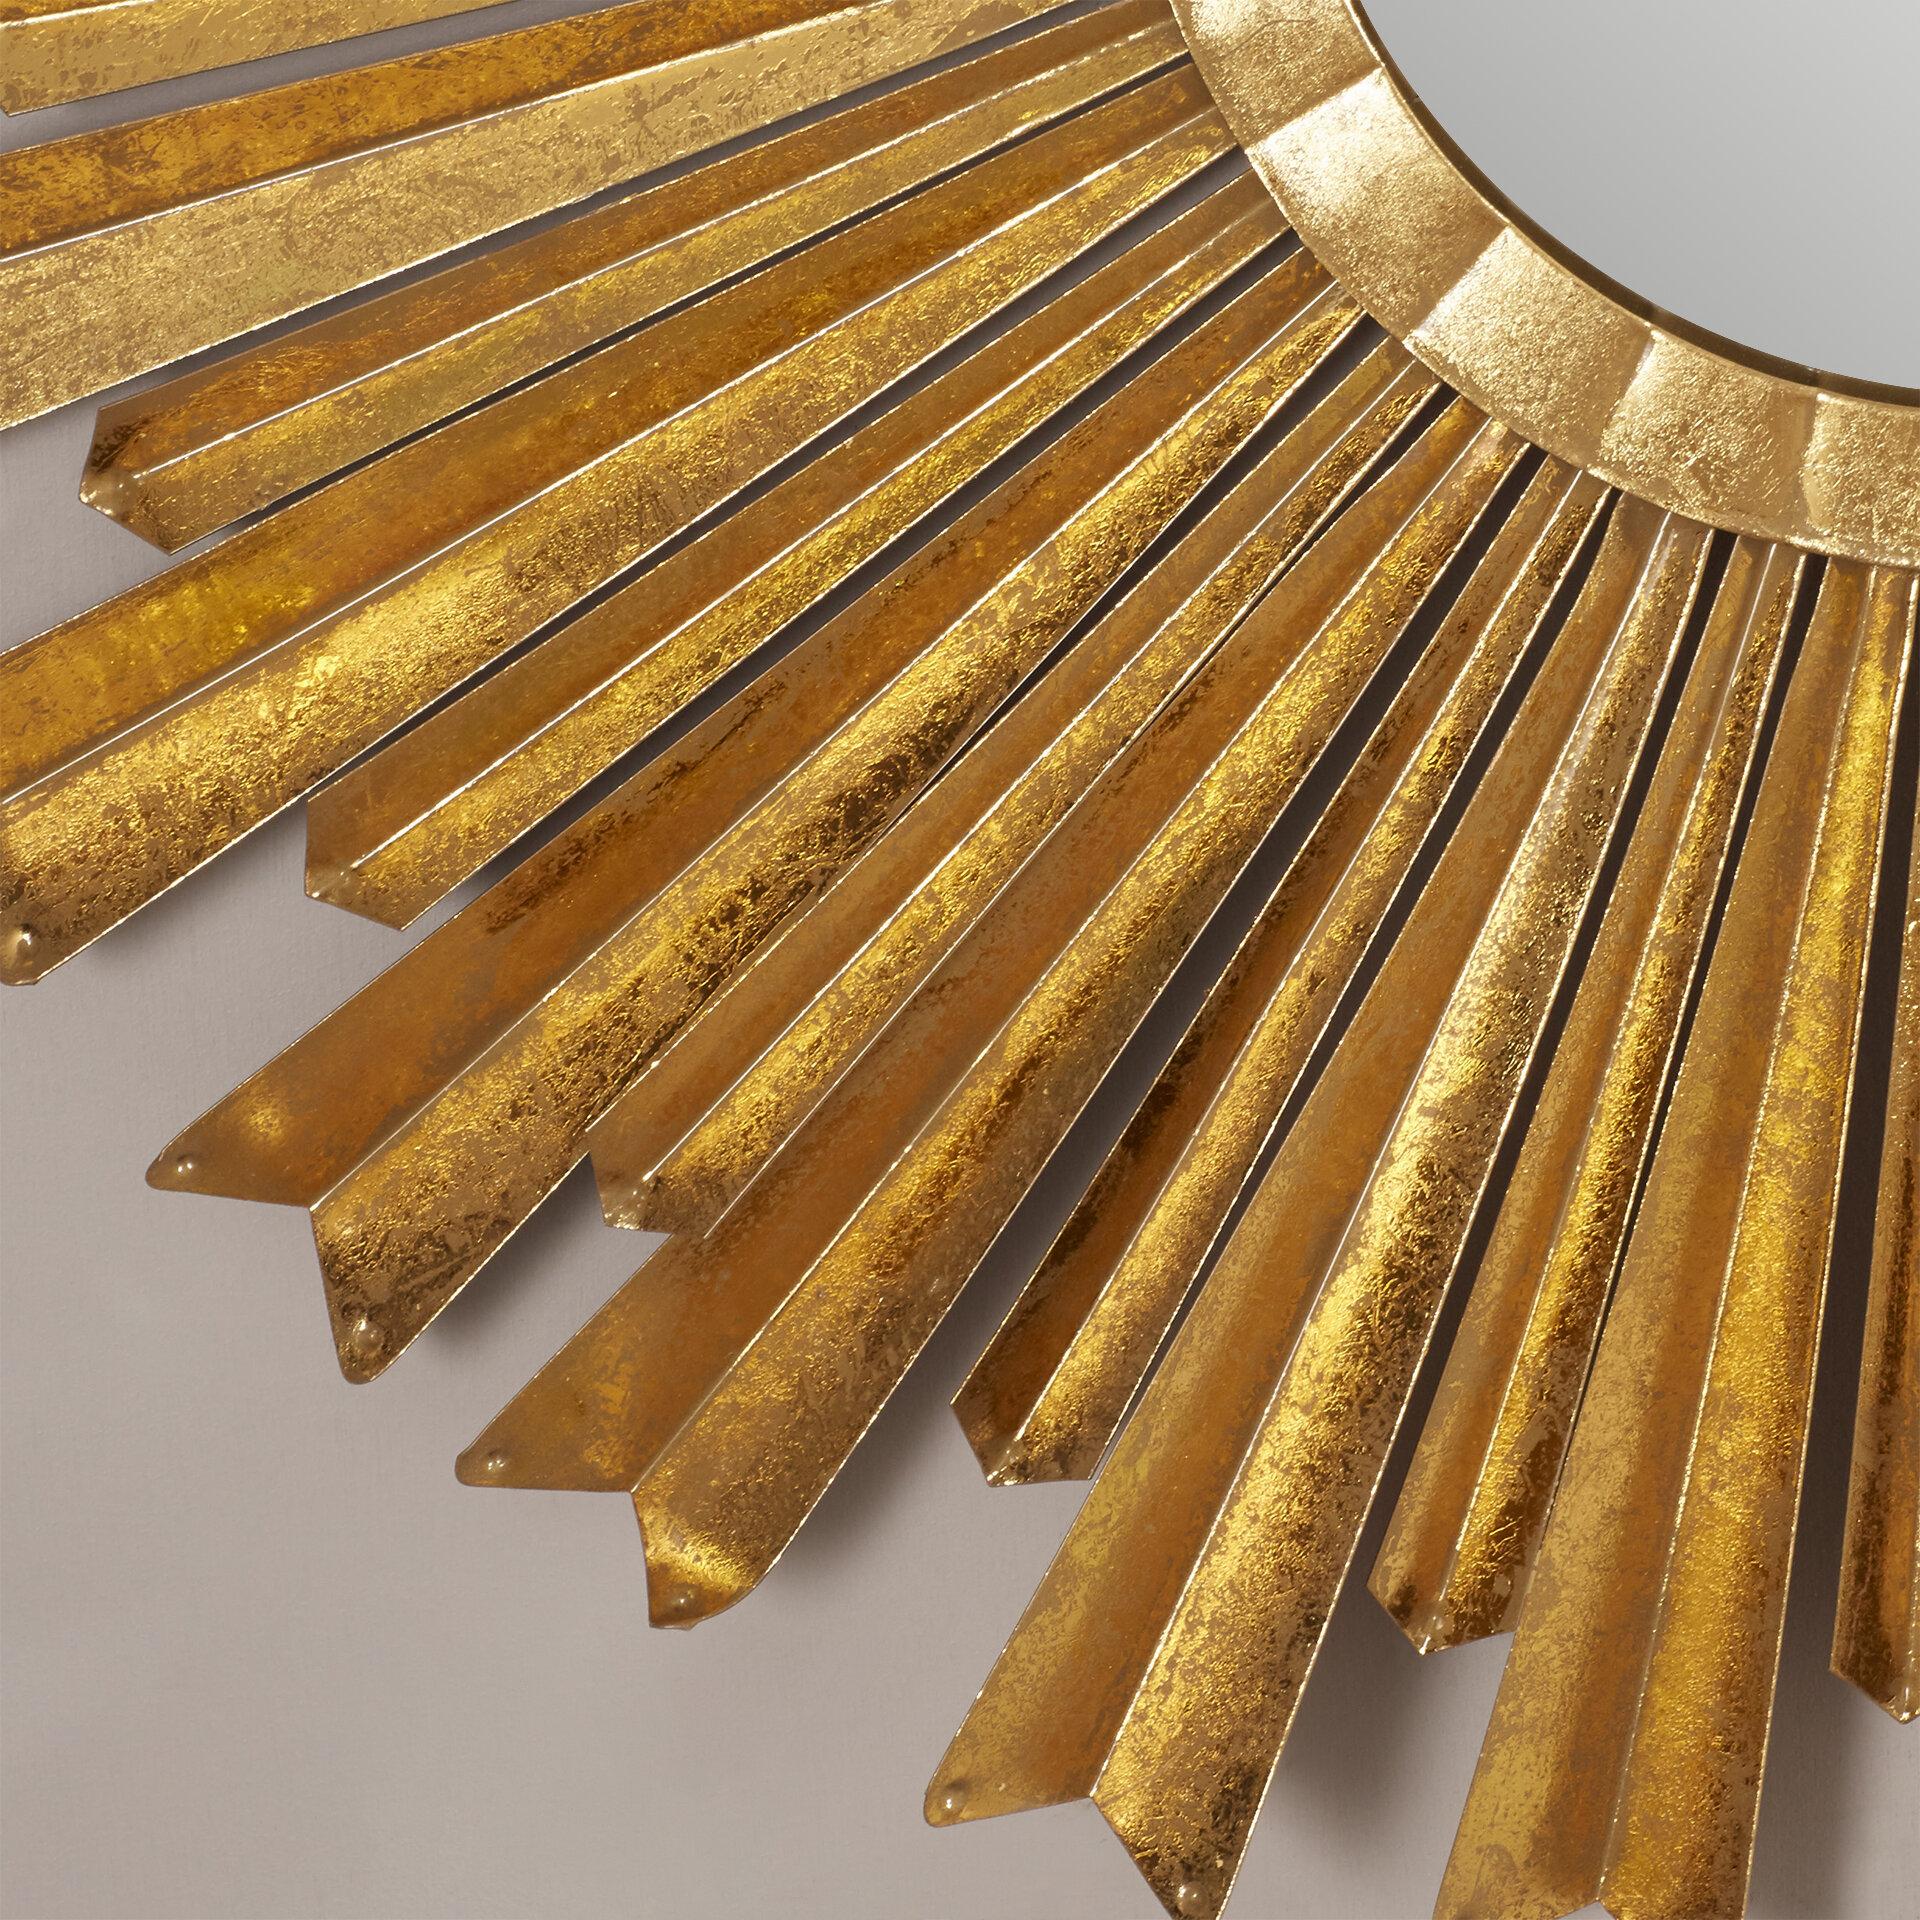 Willa Arlo Interiors Birksgate Sunburst Accent Mirror Regarding Birksgate Sunburst Accent Mirrors (View 19 of 20)